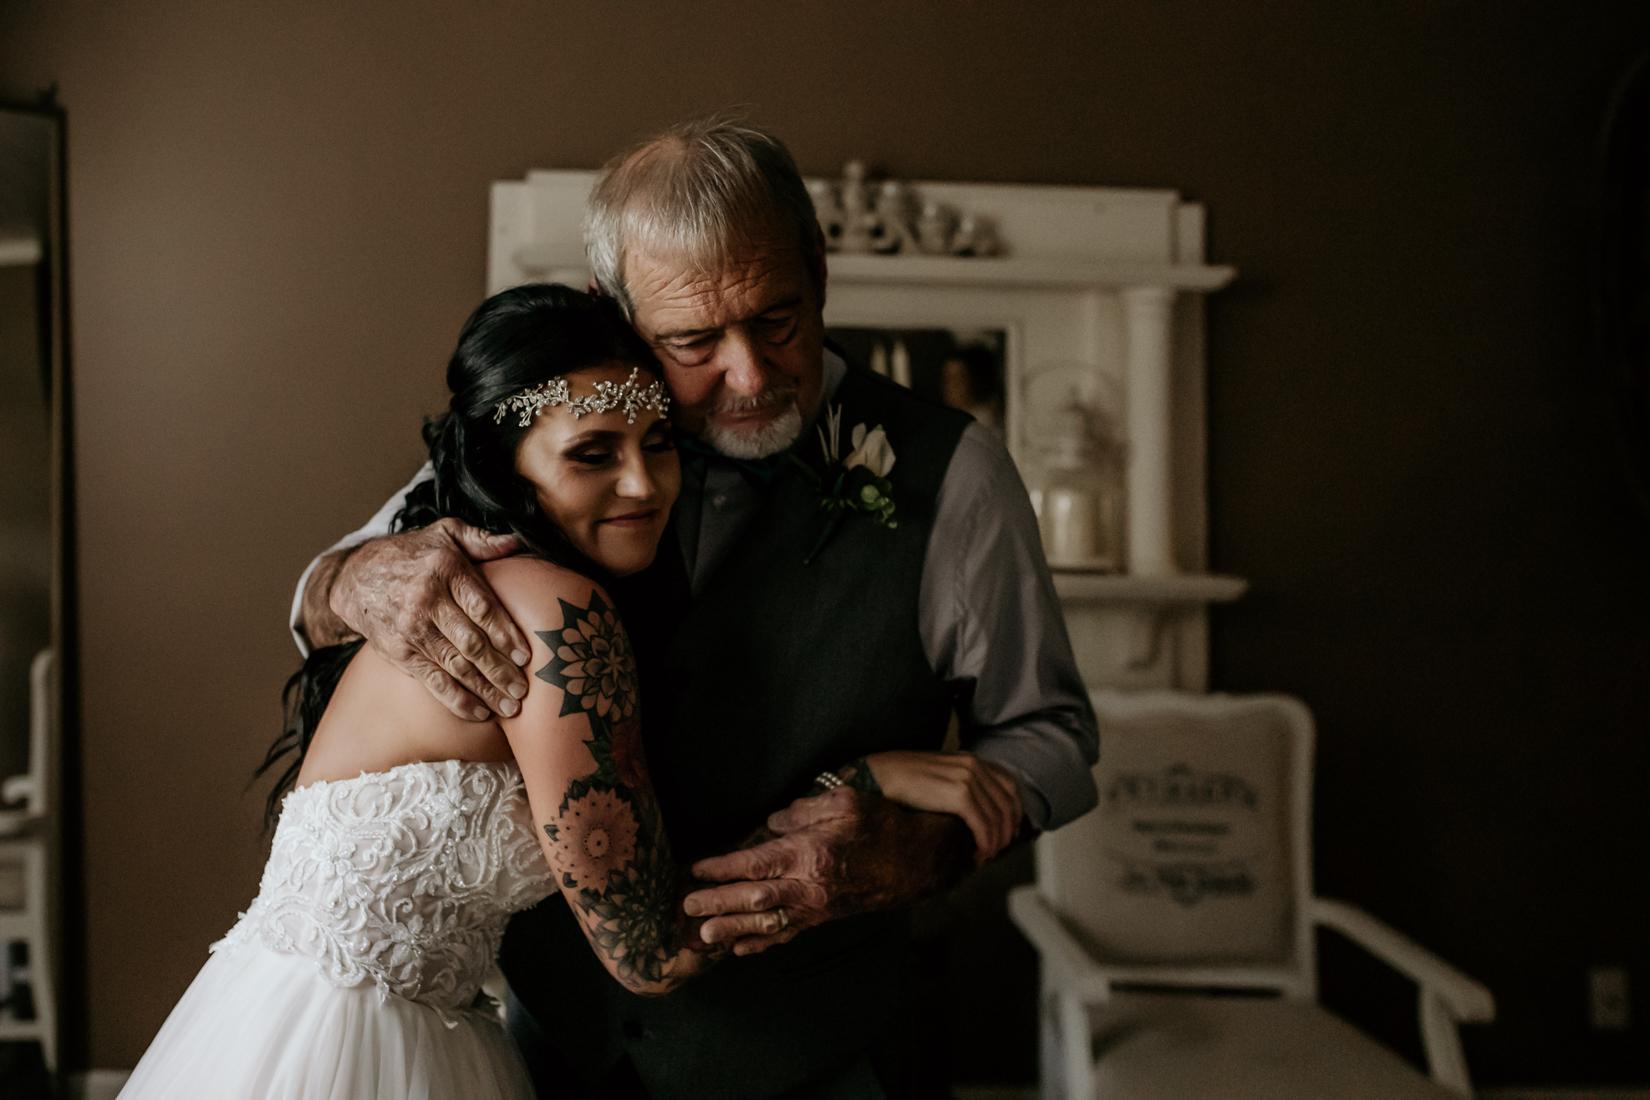 olivia_zay_wedding_09_2018-8772.jpg